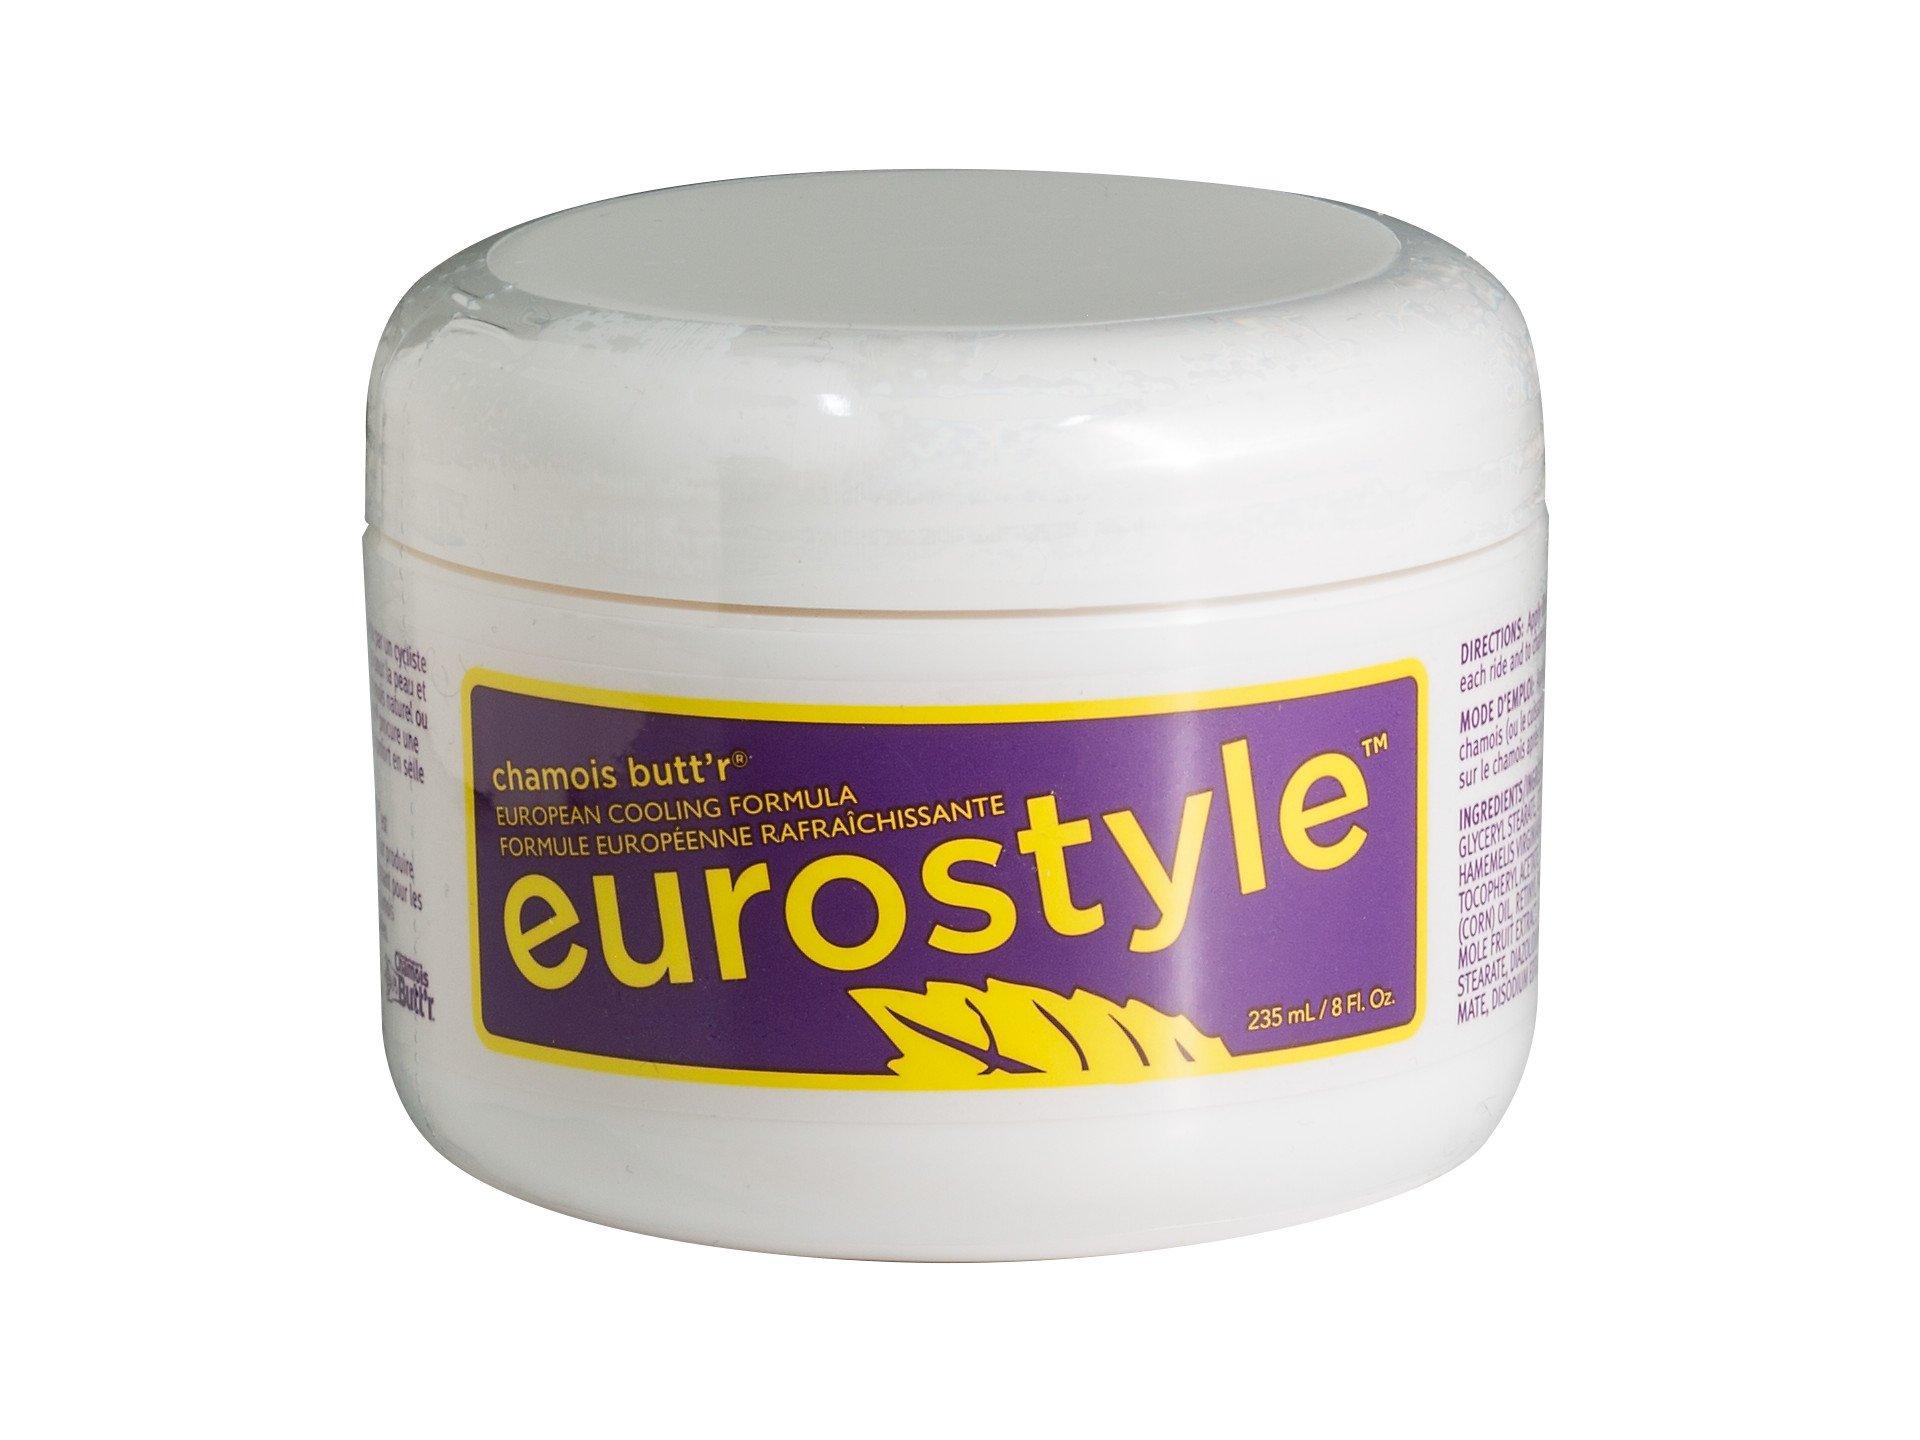 Paceline Butt'r Eurostyle 8oz Jar